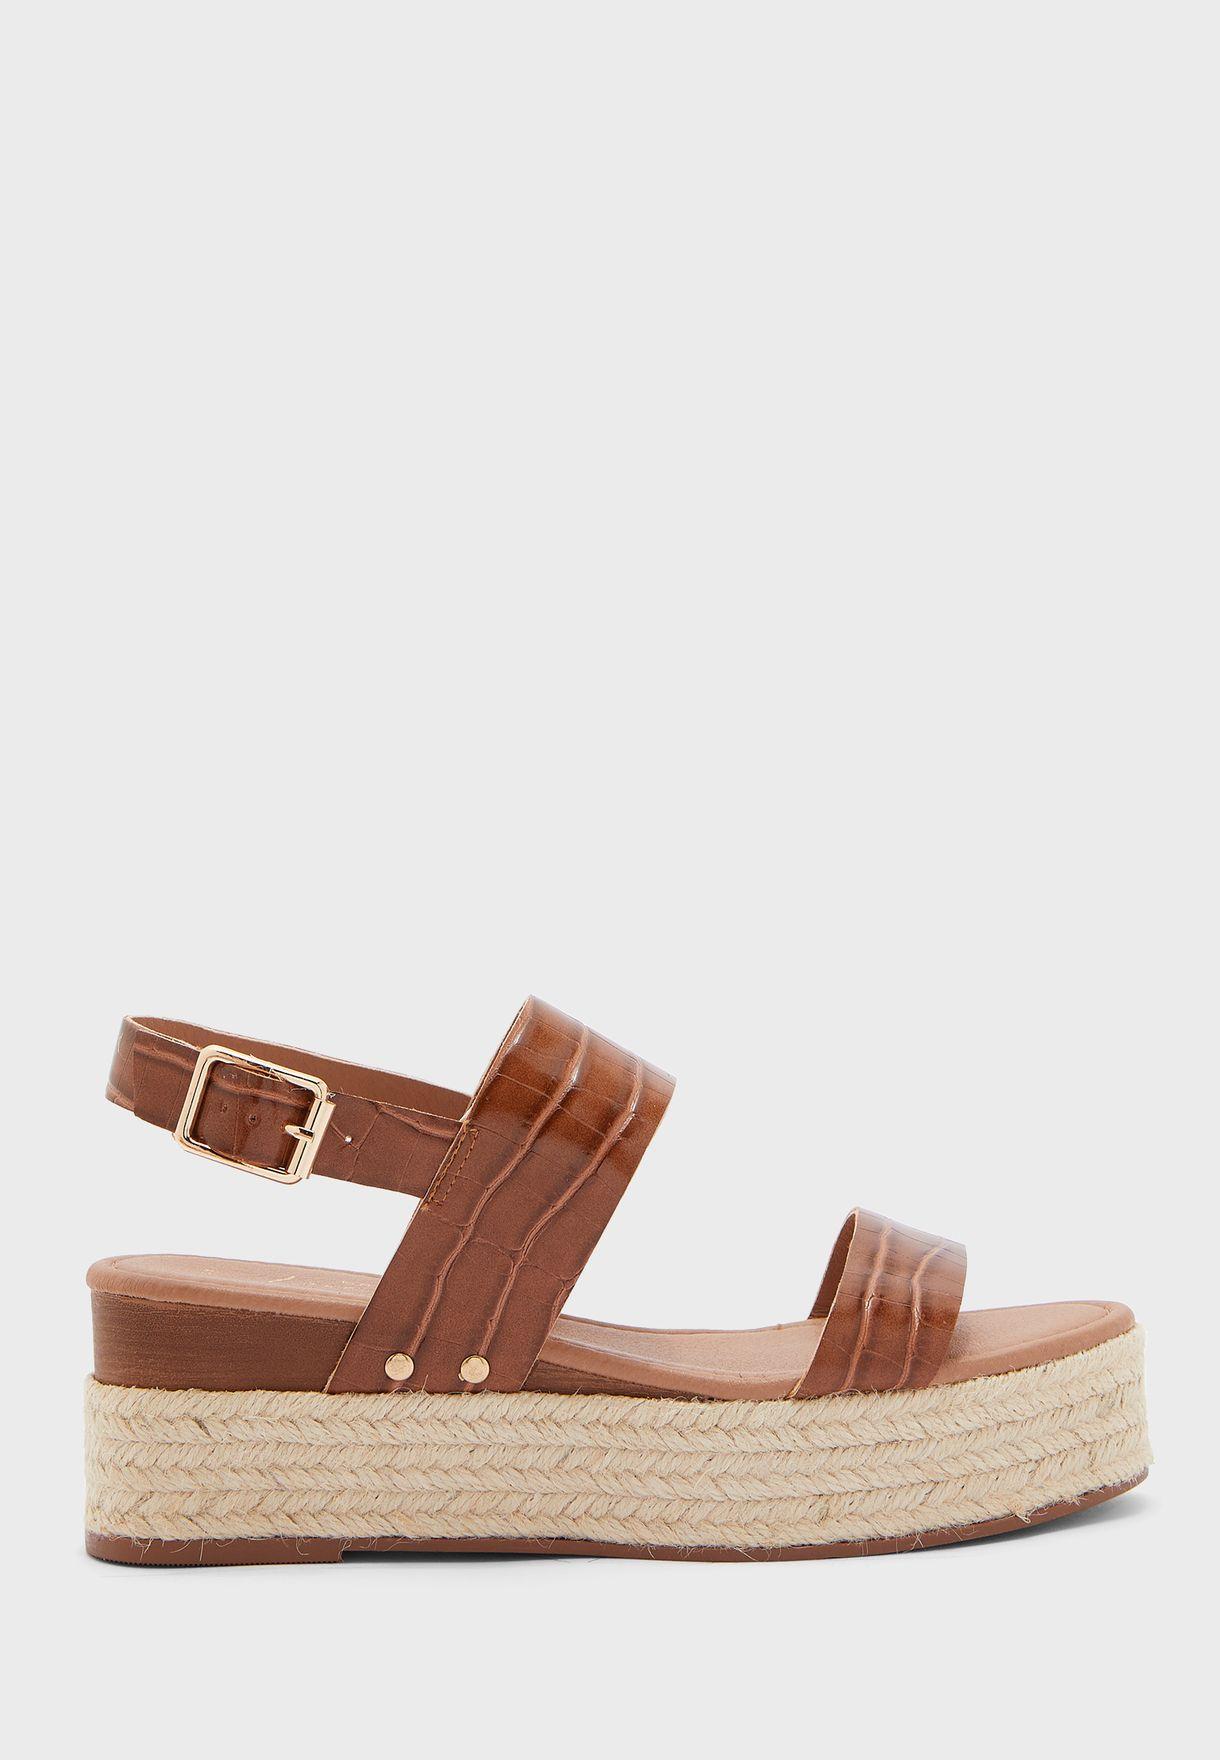 Oyster Wedge Sandal